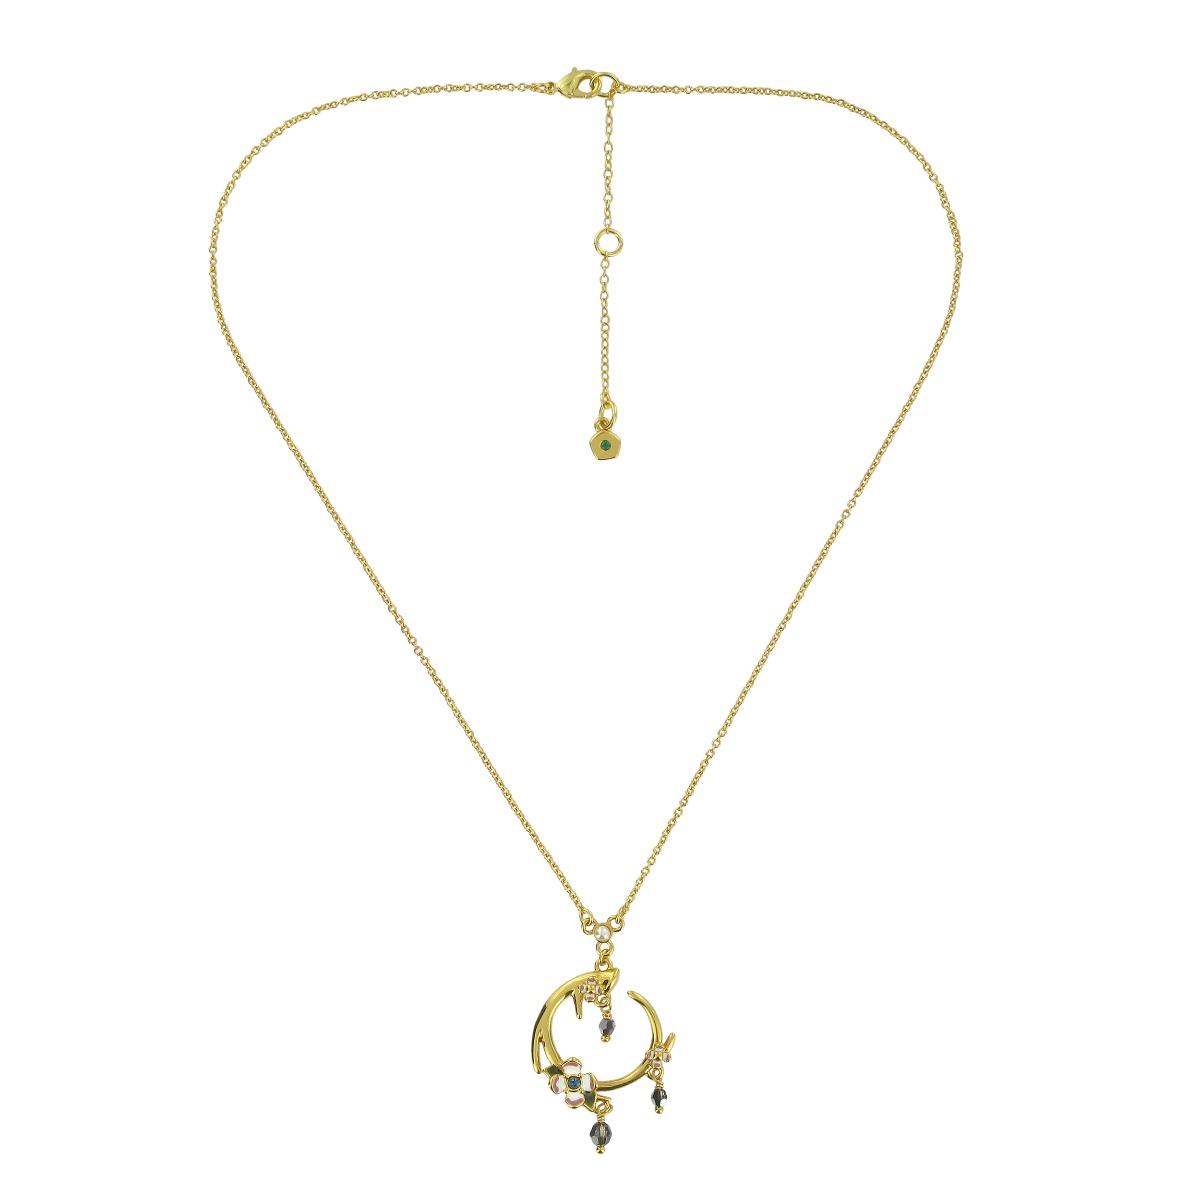 Antler pendant necklace